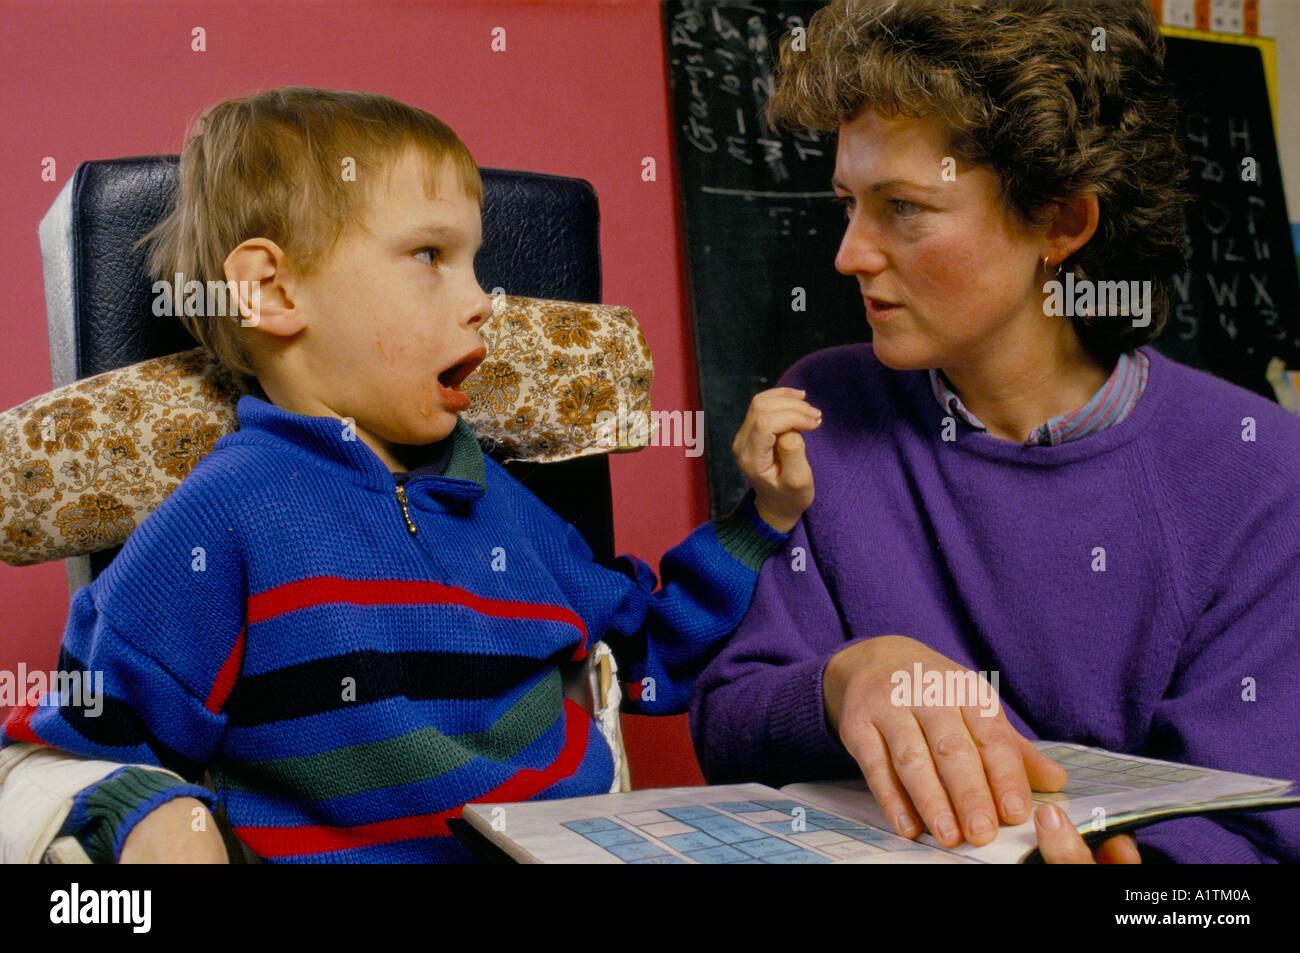 DISABLED CHILD TALKING USING BLISS SYMBOLS - Stock Image